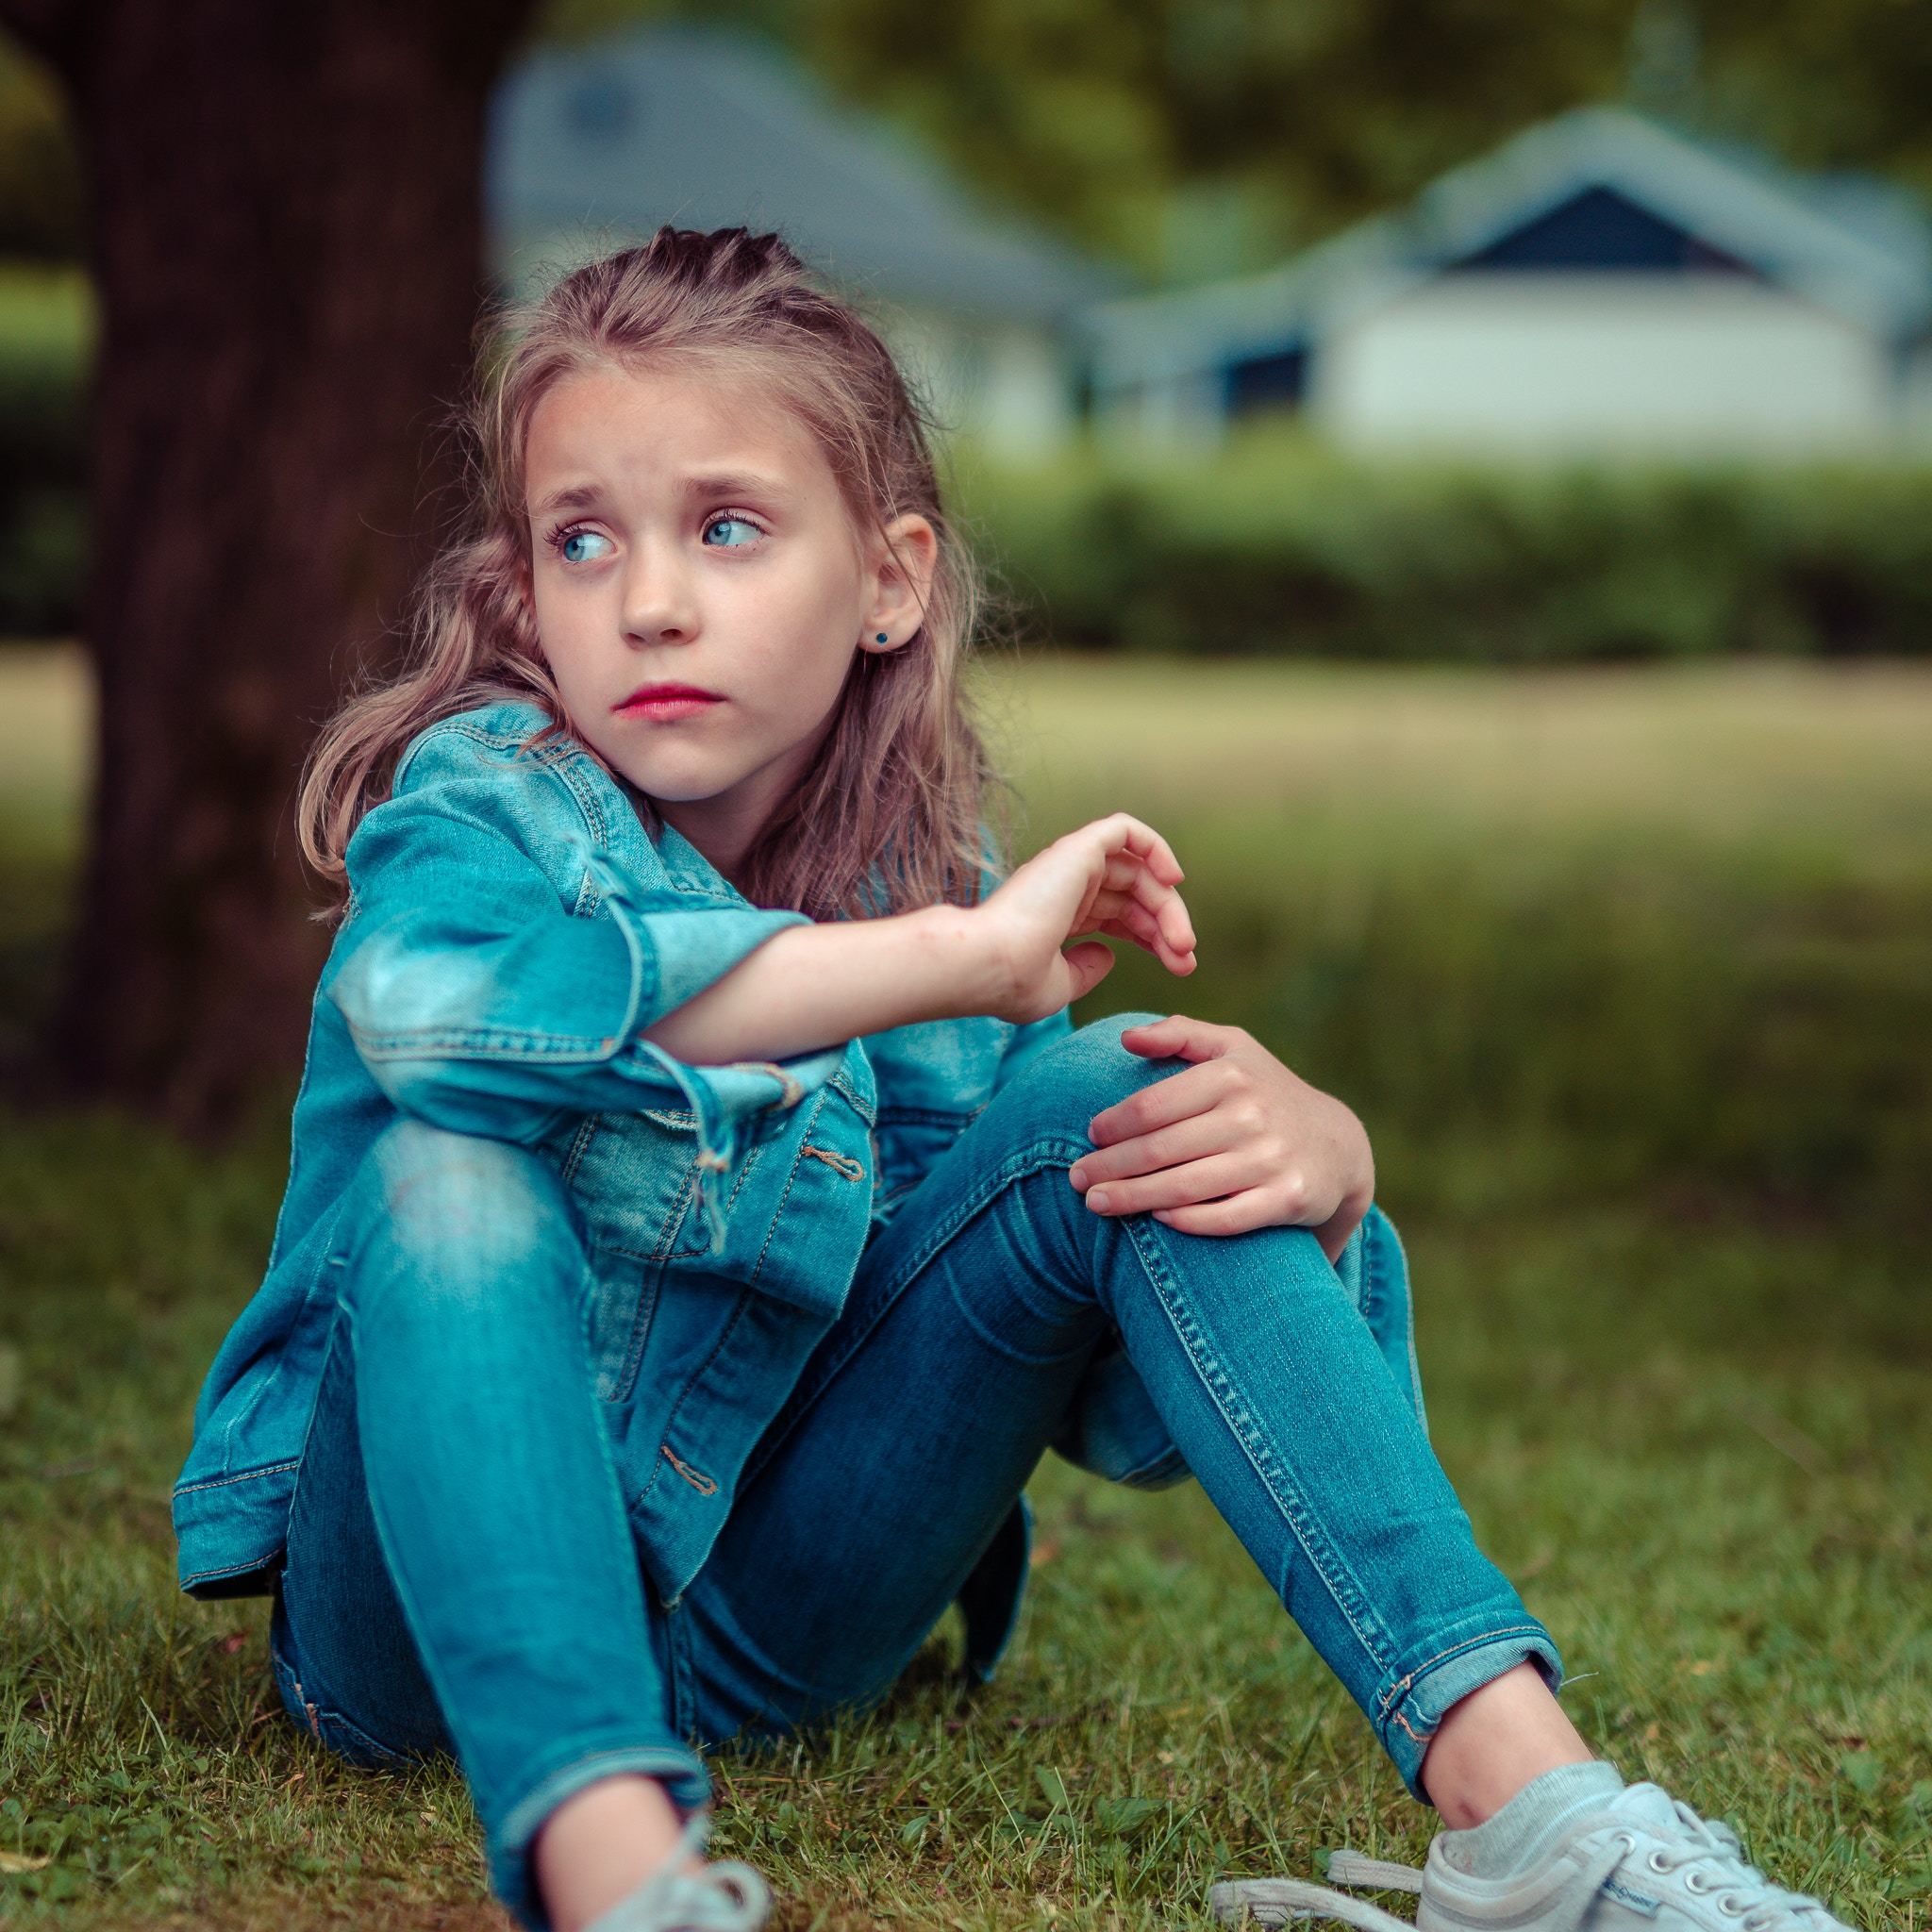 Spotting Anxiety in Children